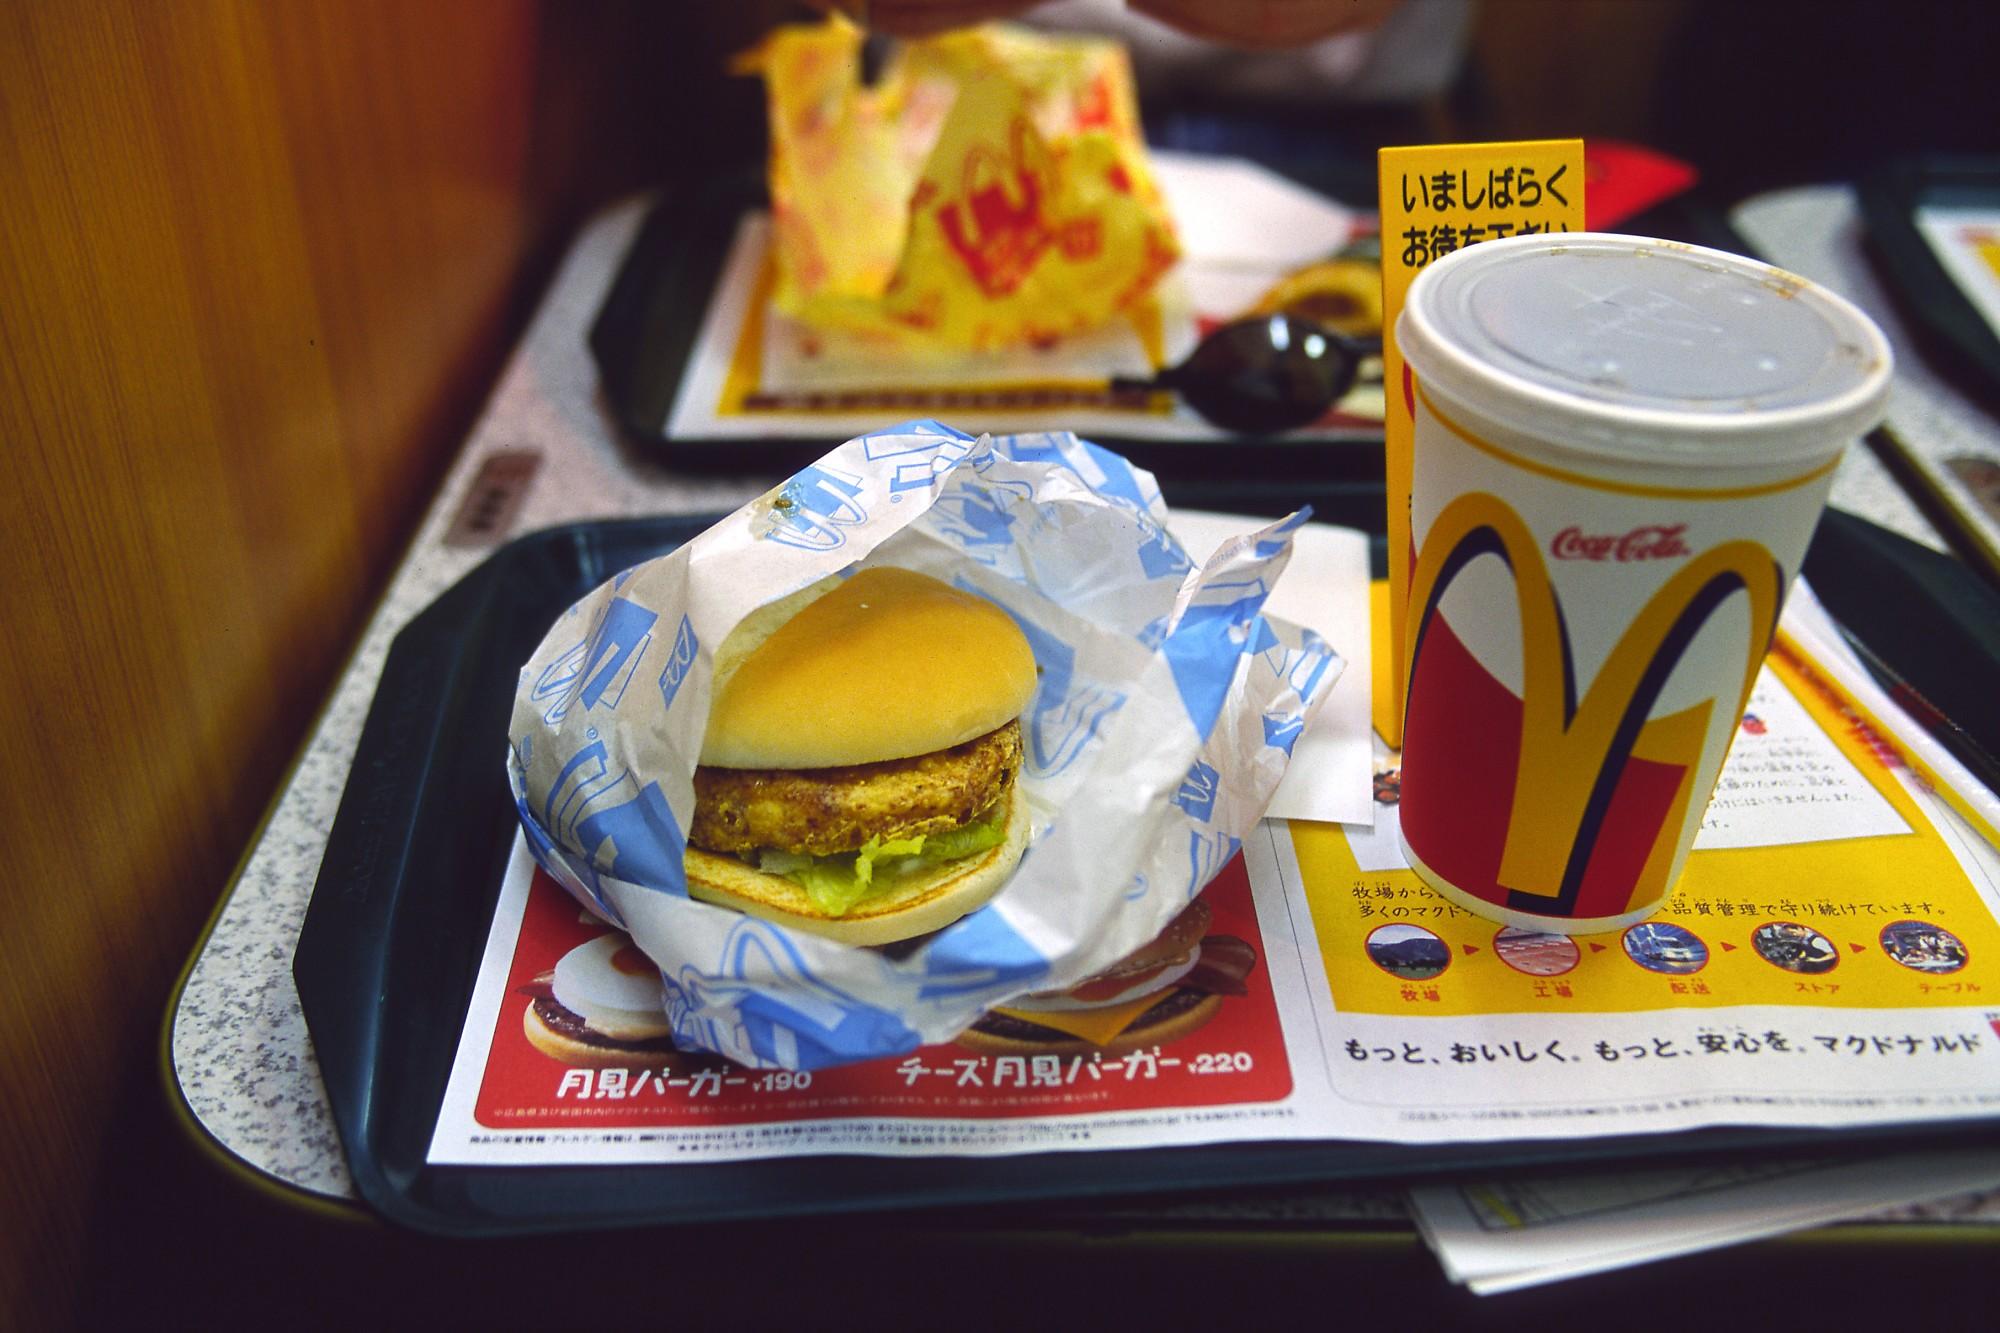 Lunch Menu Mcdonalds Time